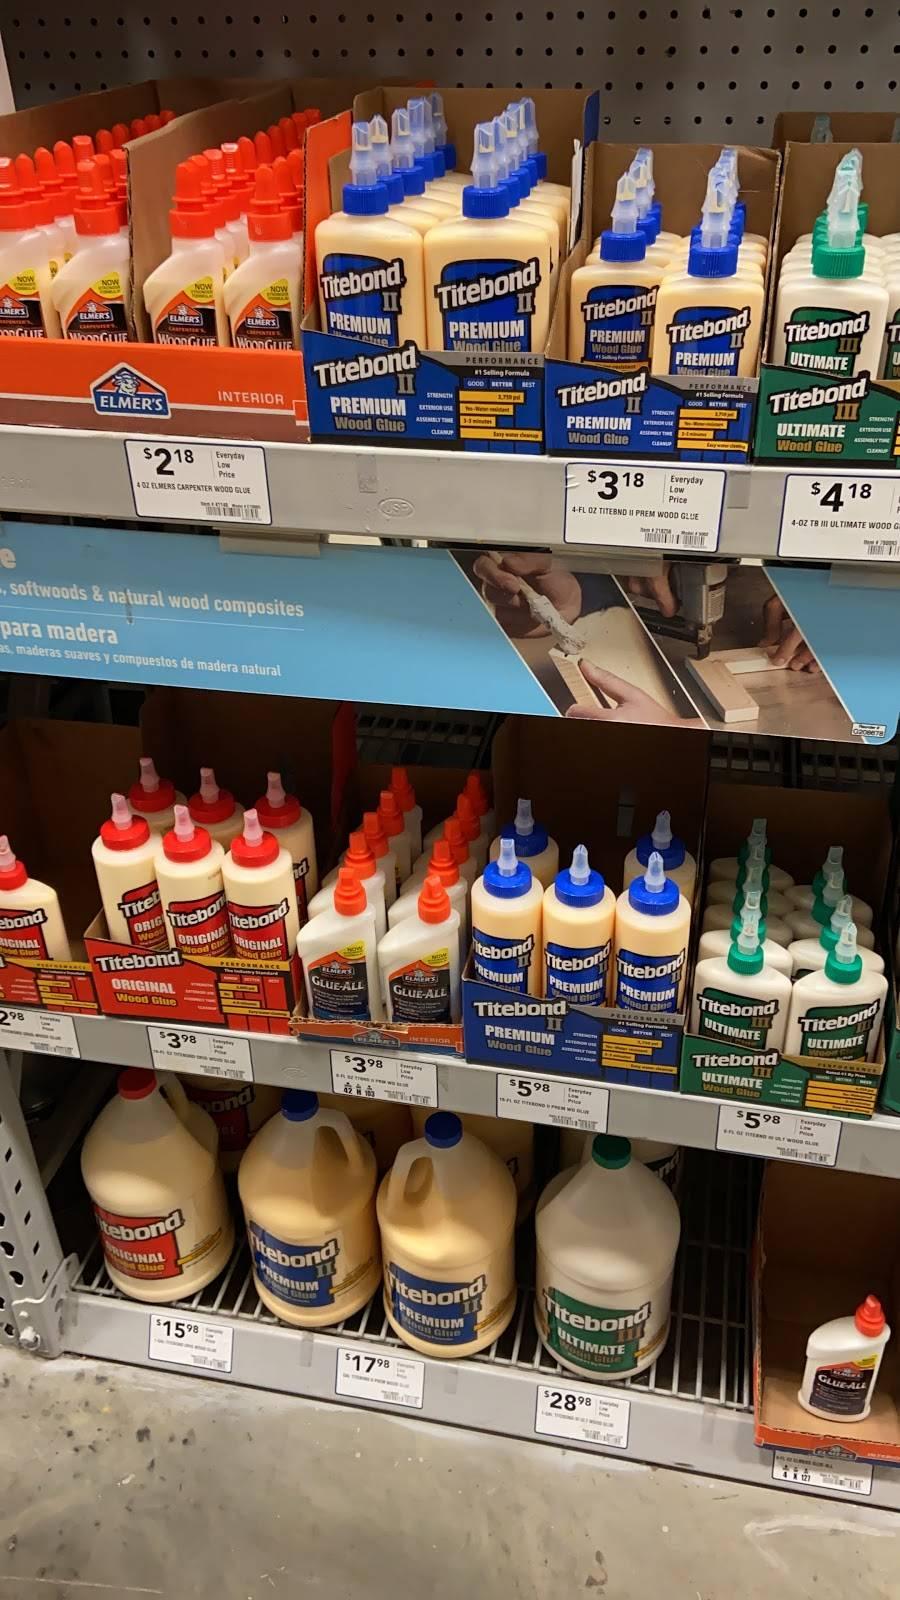 Lowes Home Improvement - hardware store  | Photo 9 of 10 | Address: 2100 Washington Pike, Carnegie, PA 15106, USA | Phone: (412) 200-3101